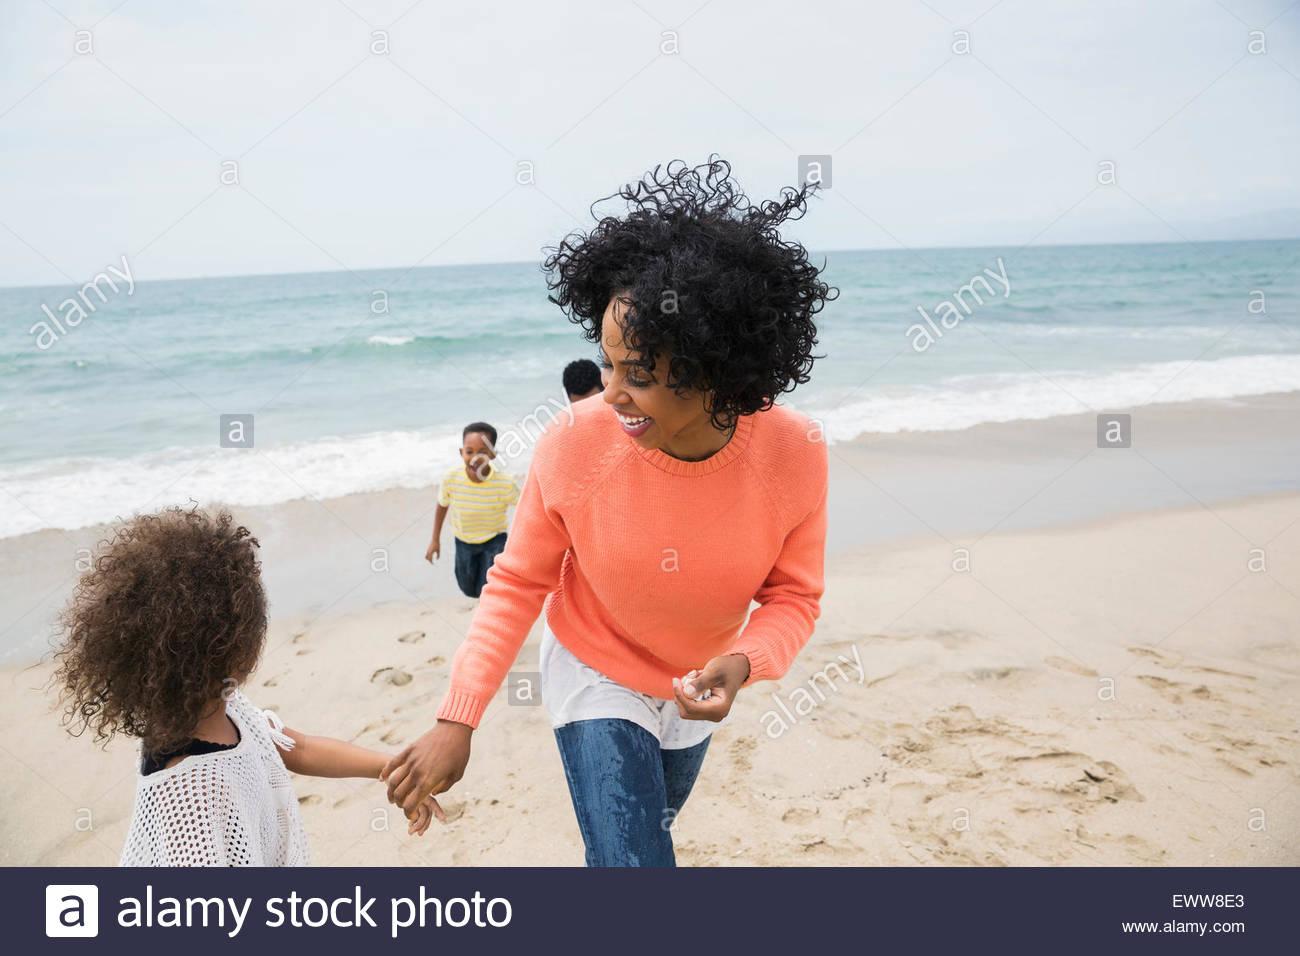 Family walking on beach - Stock Image